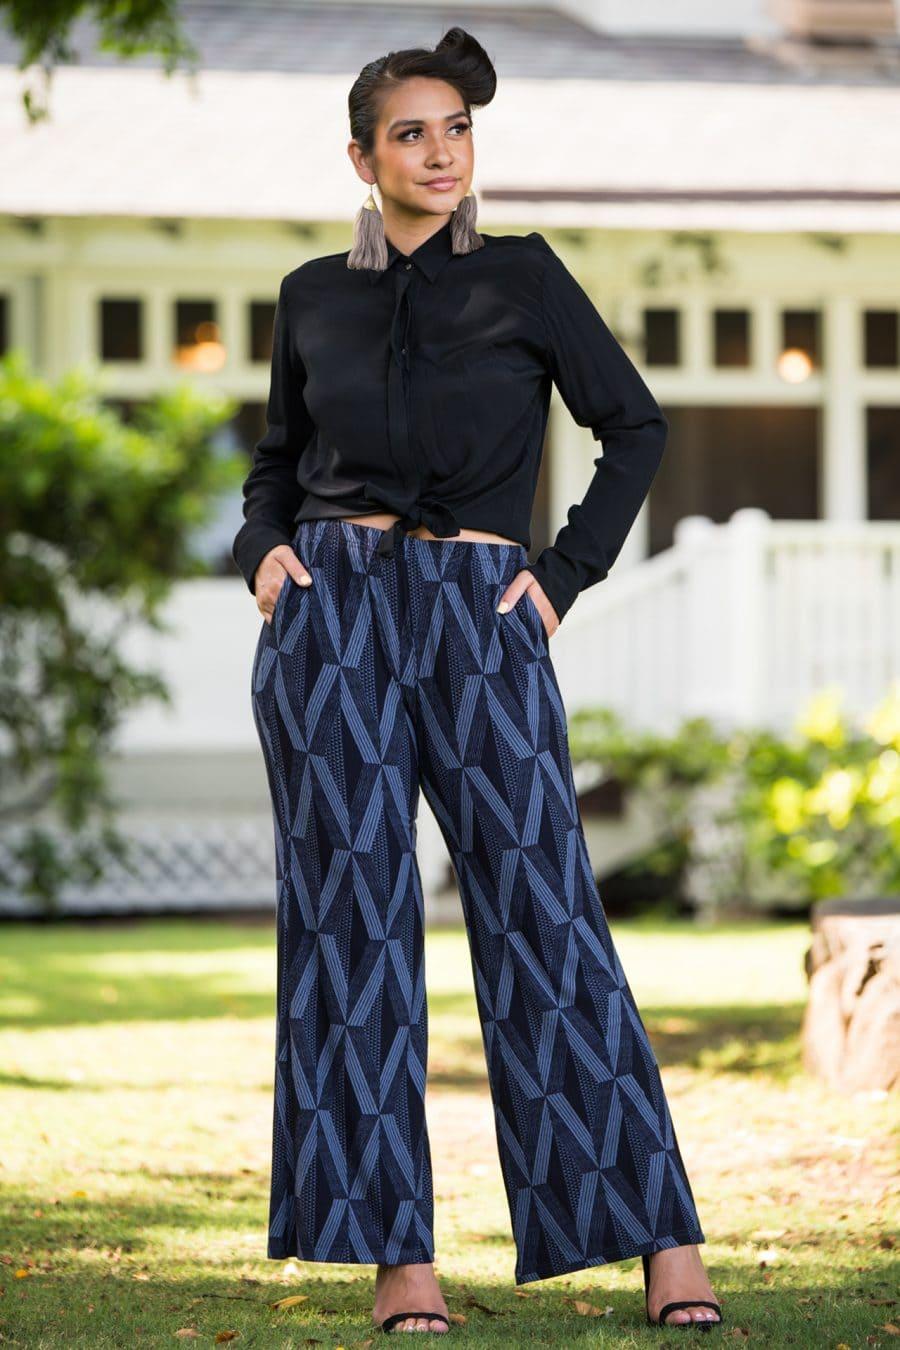 Model wearing Awapuhi Pant in Deepwell Folkstone Grey Kanaloa Pattern - Front View